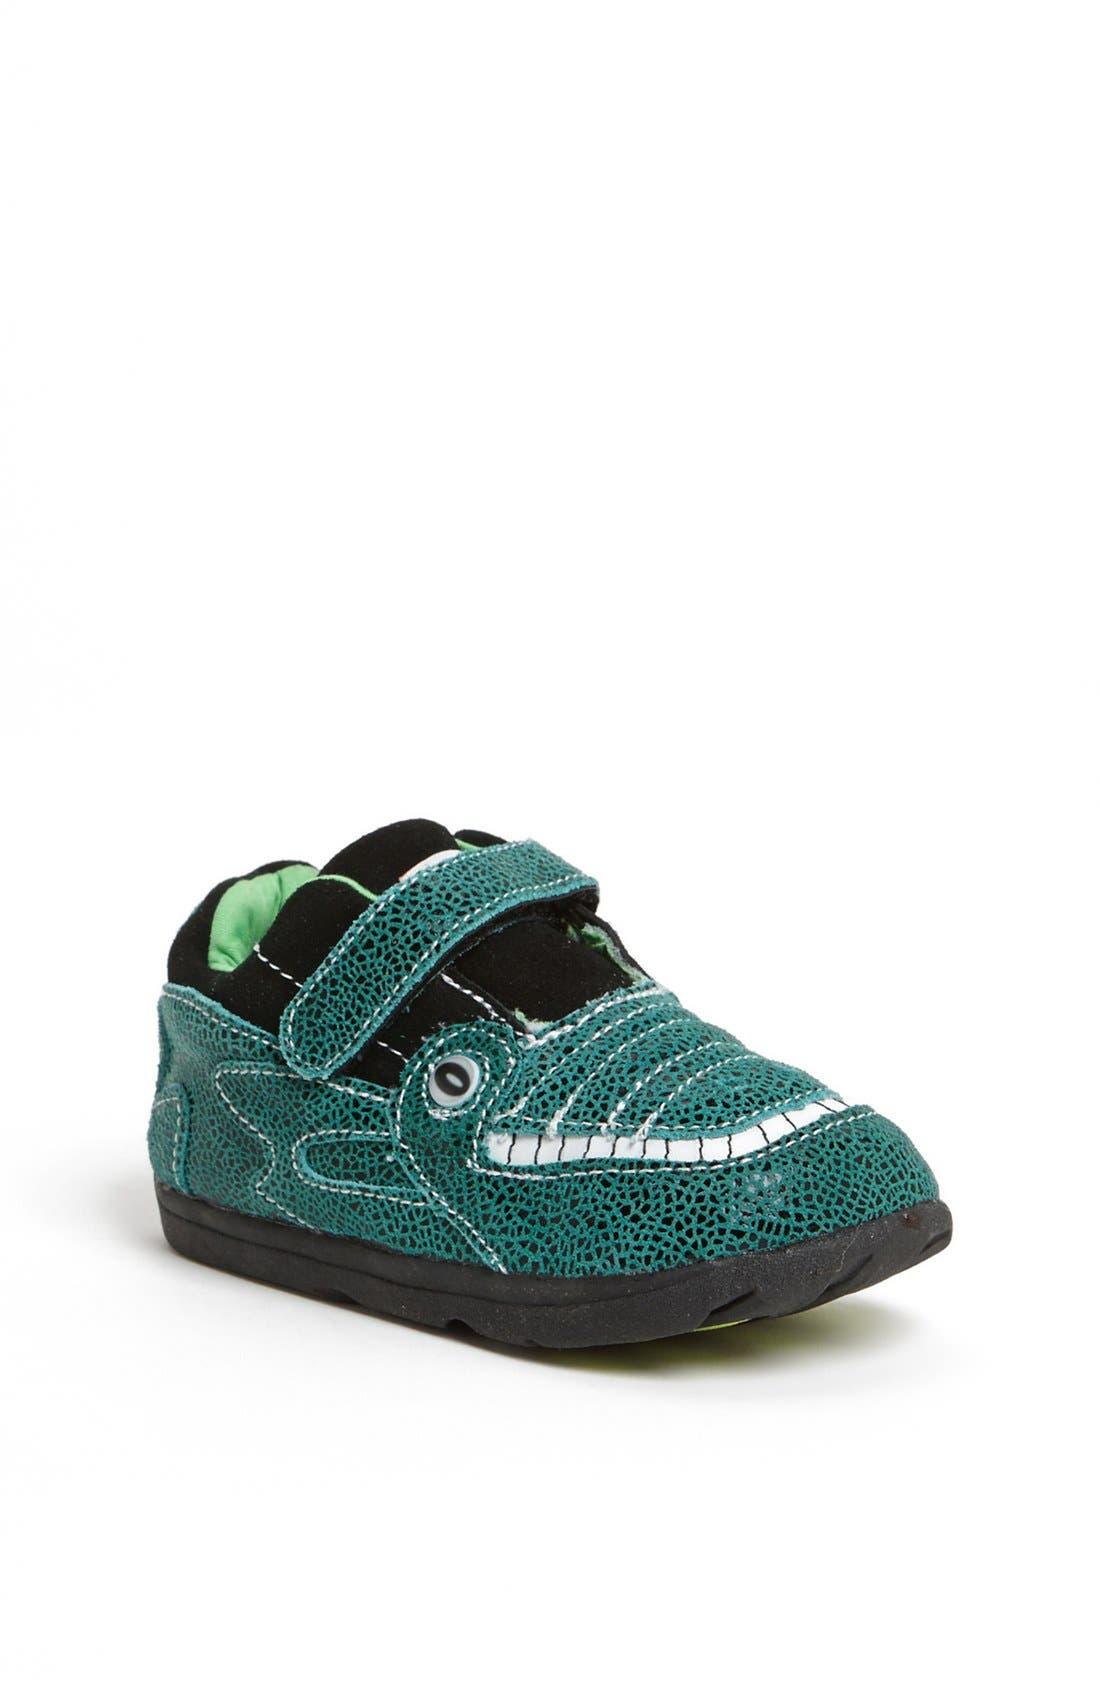 Main Image - Zooligans™ 'Jacques the Gator' Sneaker (Baby, Walker, Toddler & Little Kid)